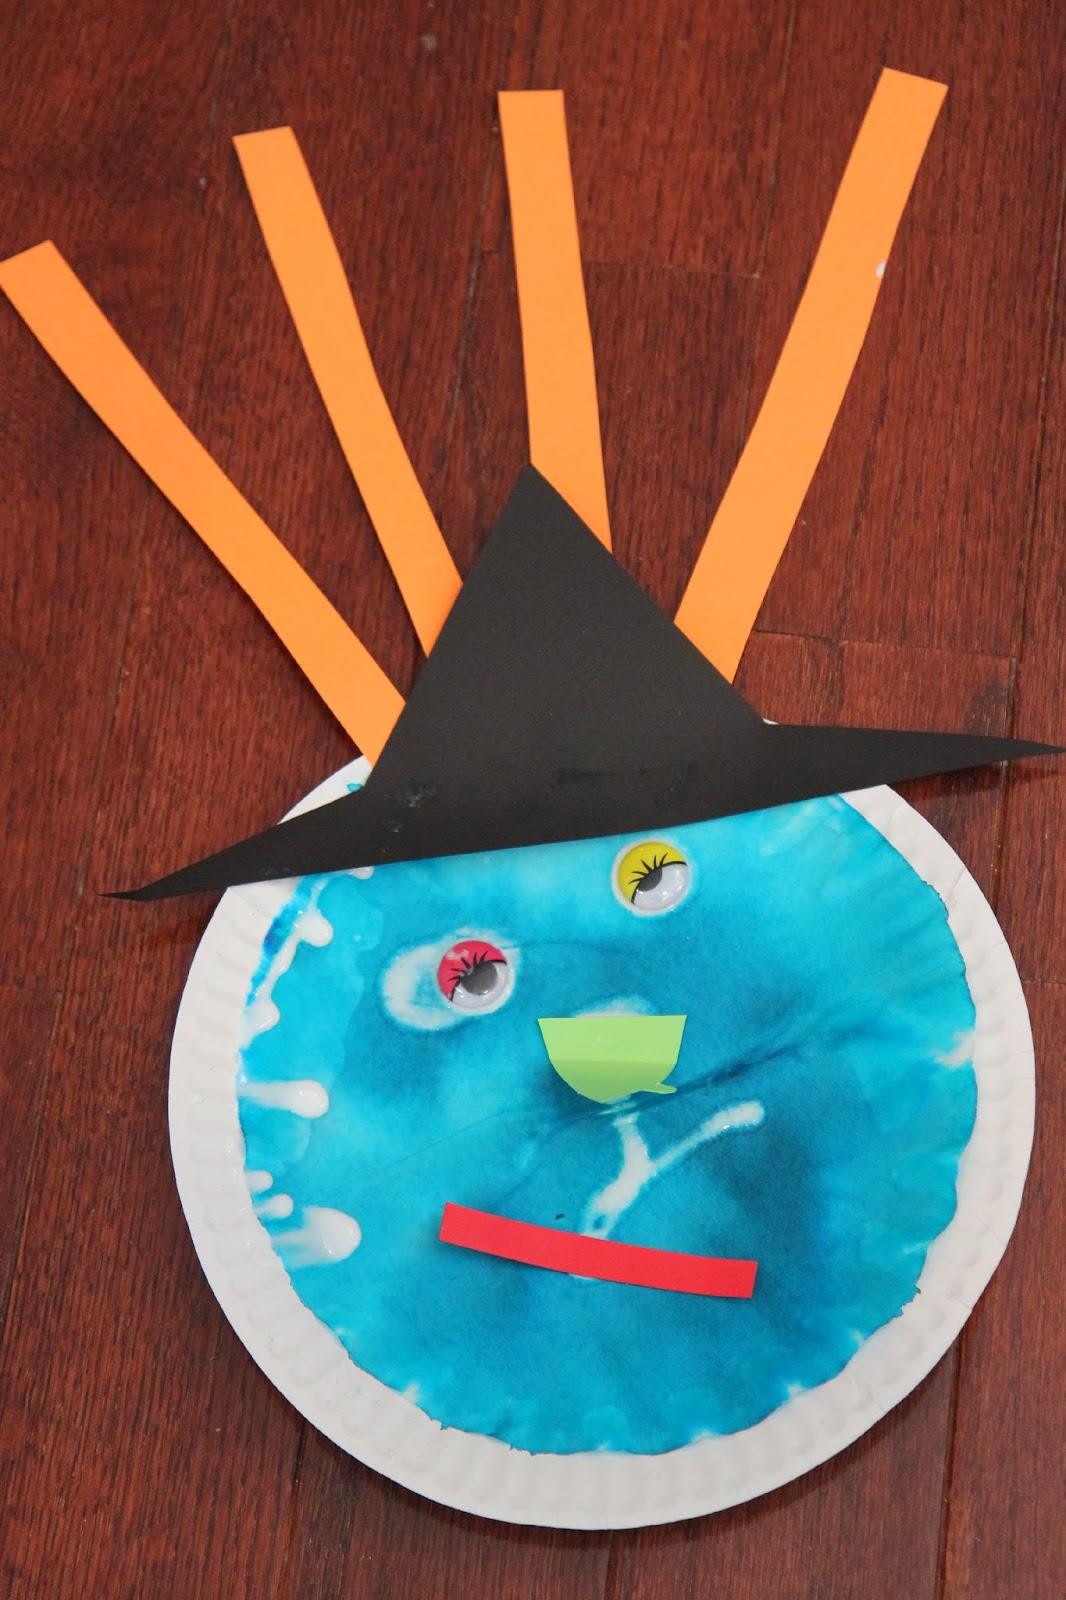 Witch Themed Preschool Crafts u0026 Activities Preschool Spotlight & Toddler Approved!: Witch Themed Preschool Crafts u0026 Activities ...